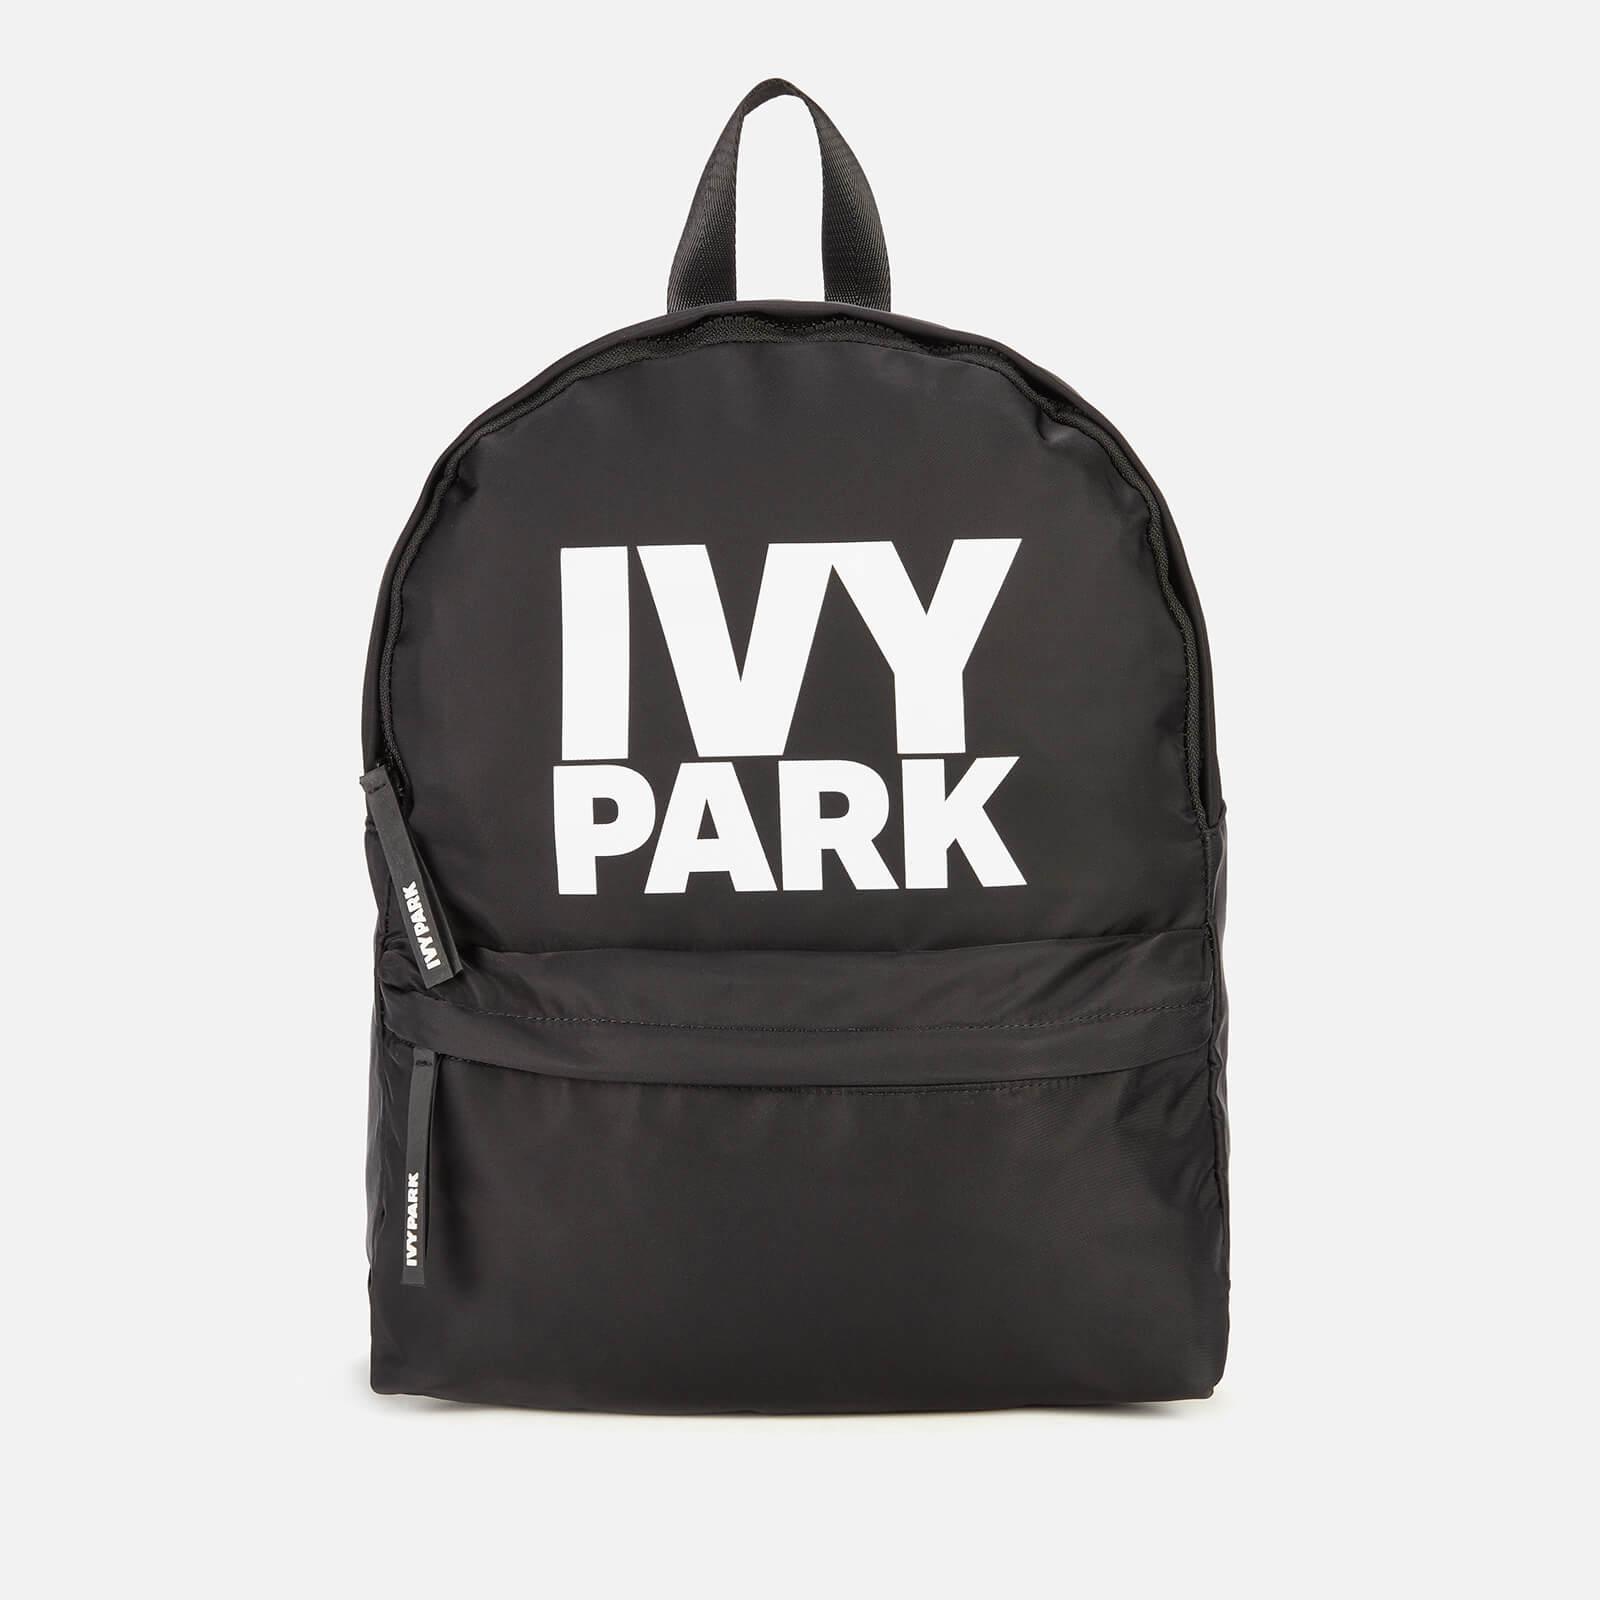 Ivy Park Women's Stacked Logo Backpack - Black